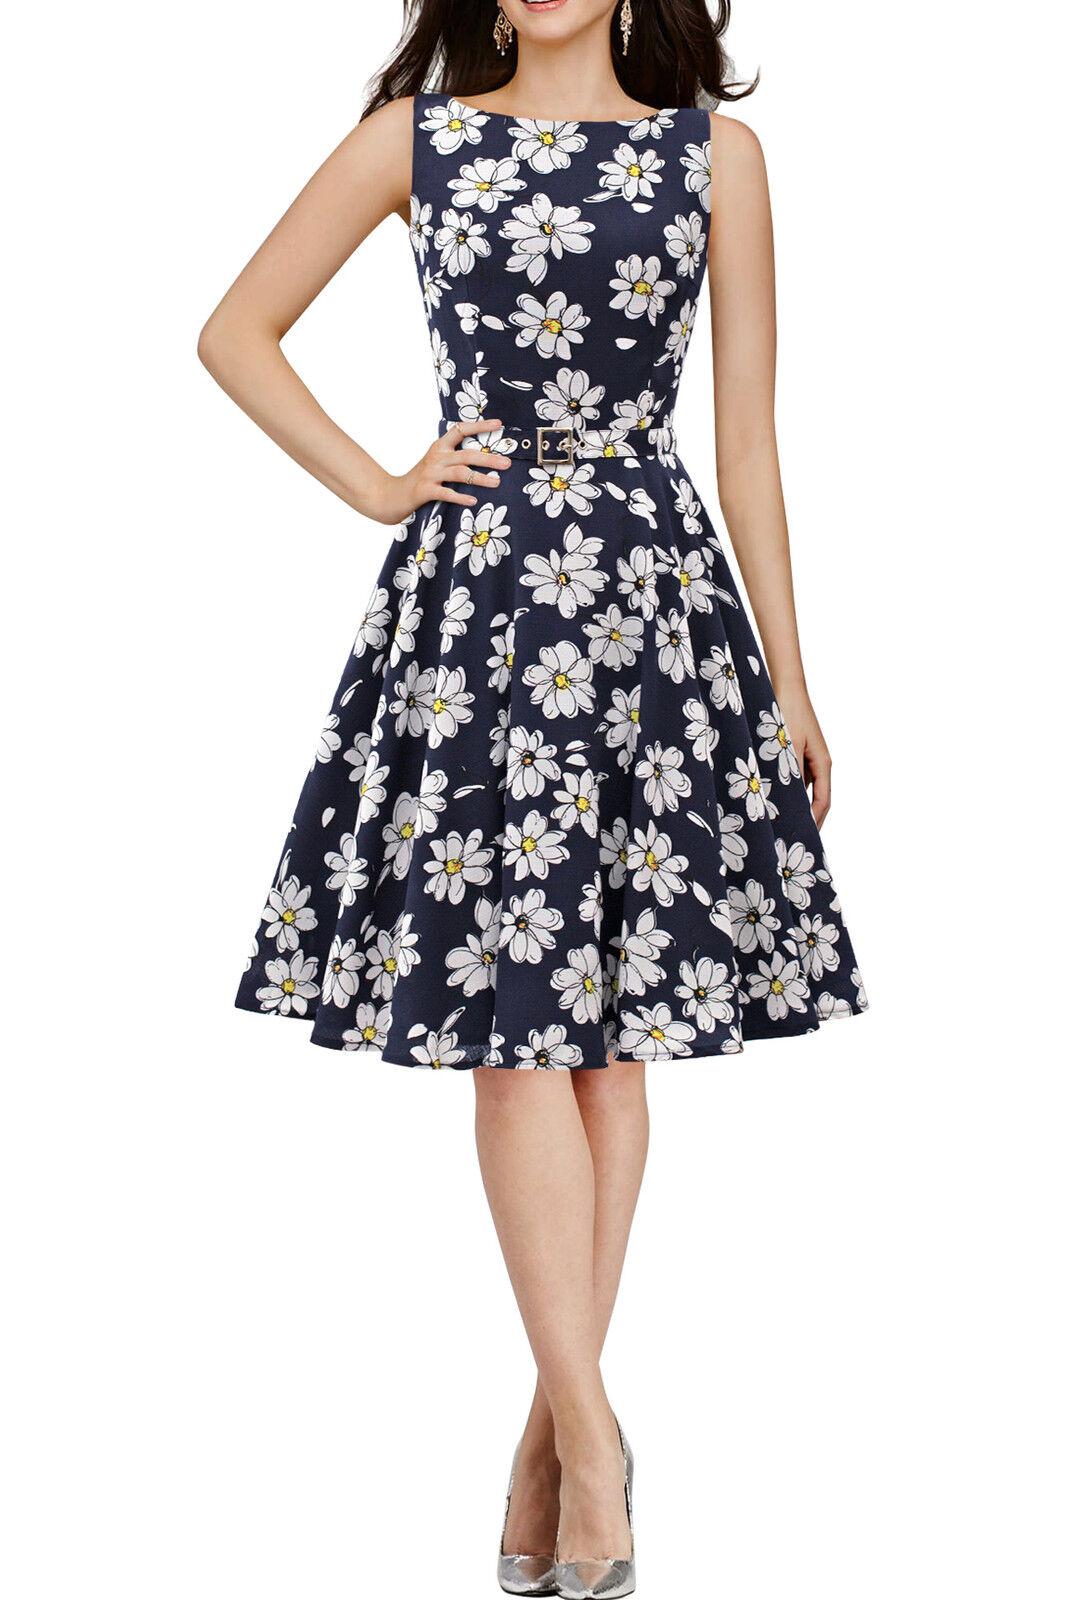 nerobutterfly  AUDREY  VINTAGE DAISY VINTAGE 50's Rockabilly Swing Prom Dress